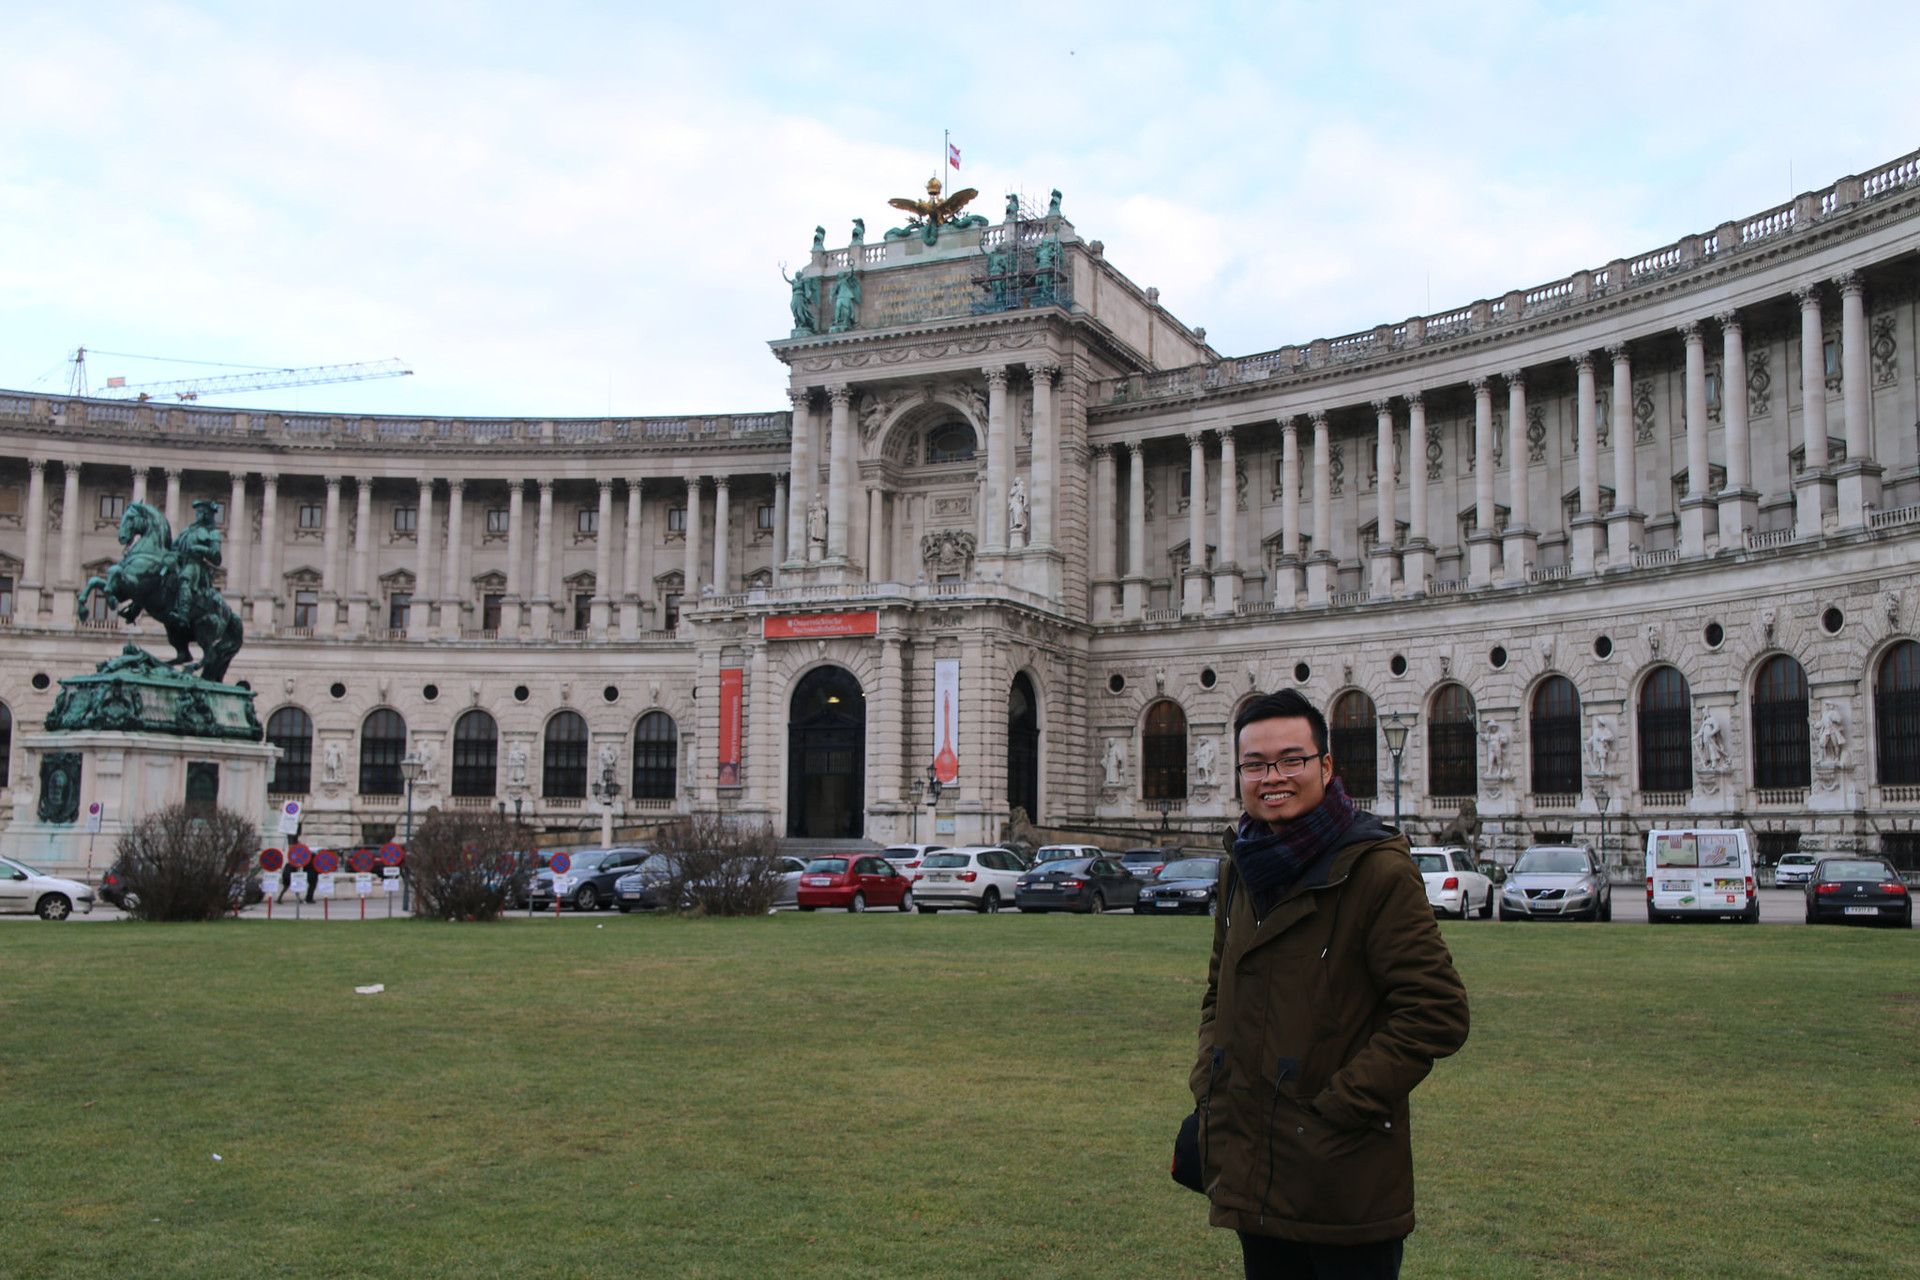 austria-my-experience-public-transportat